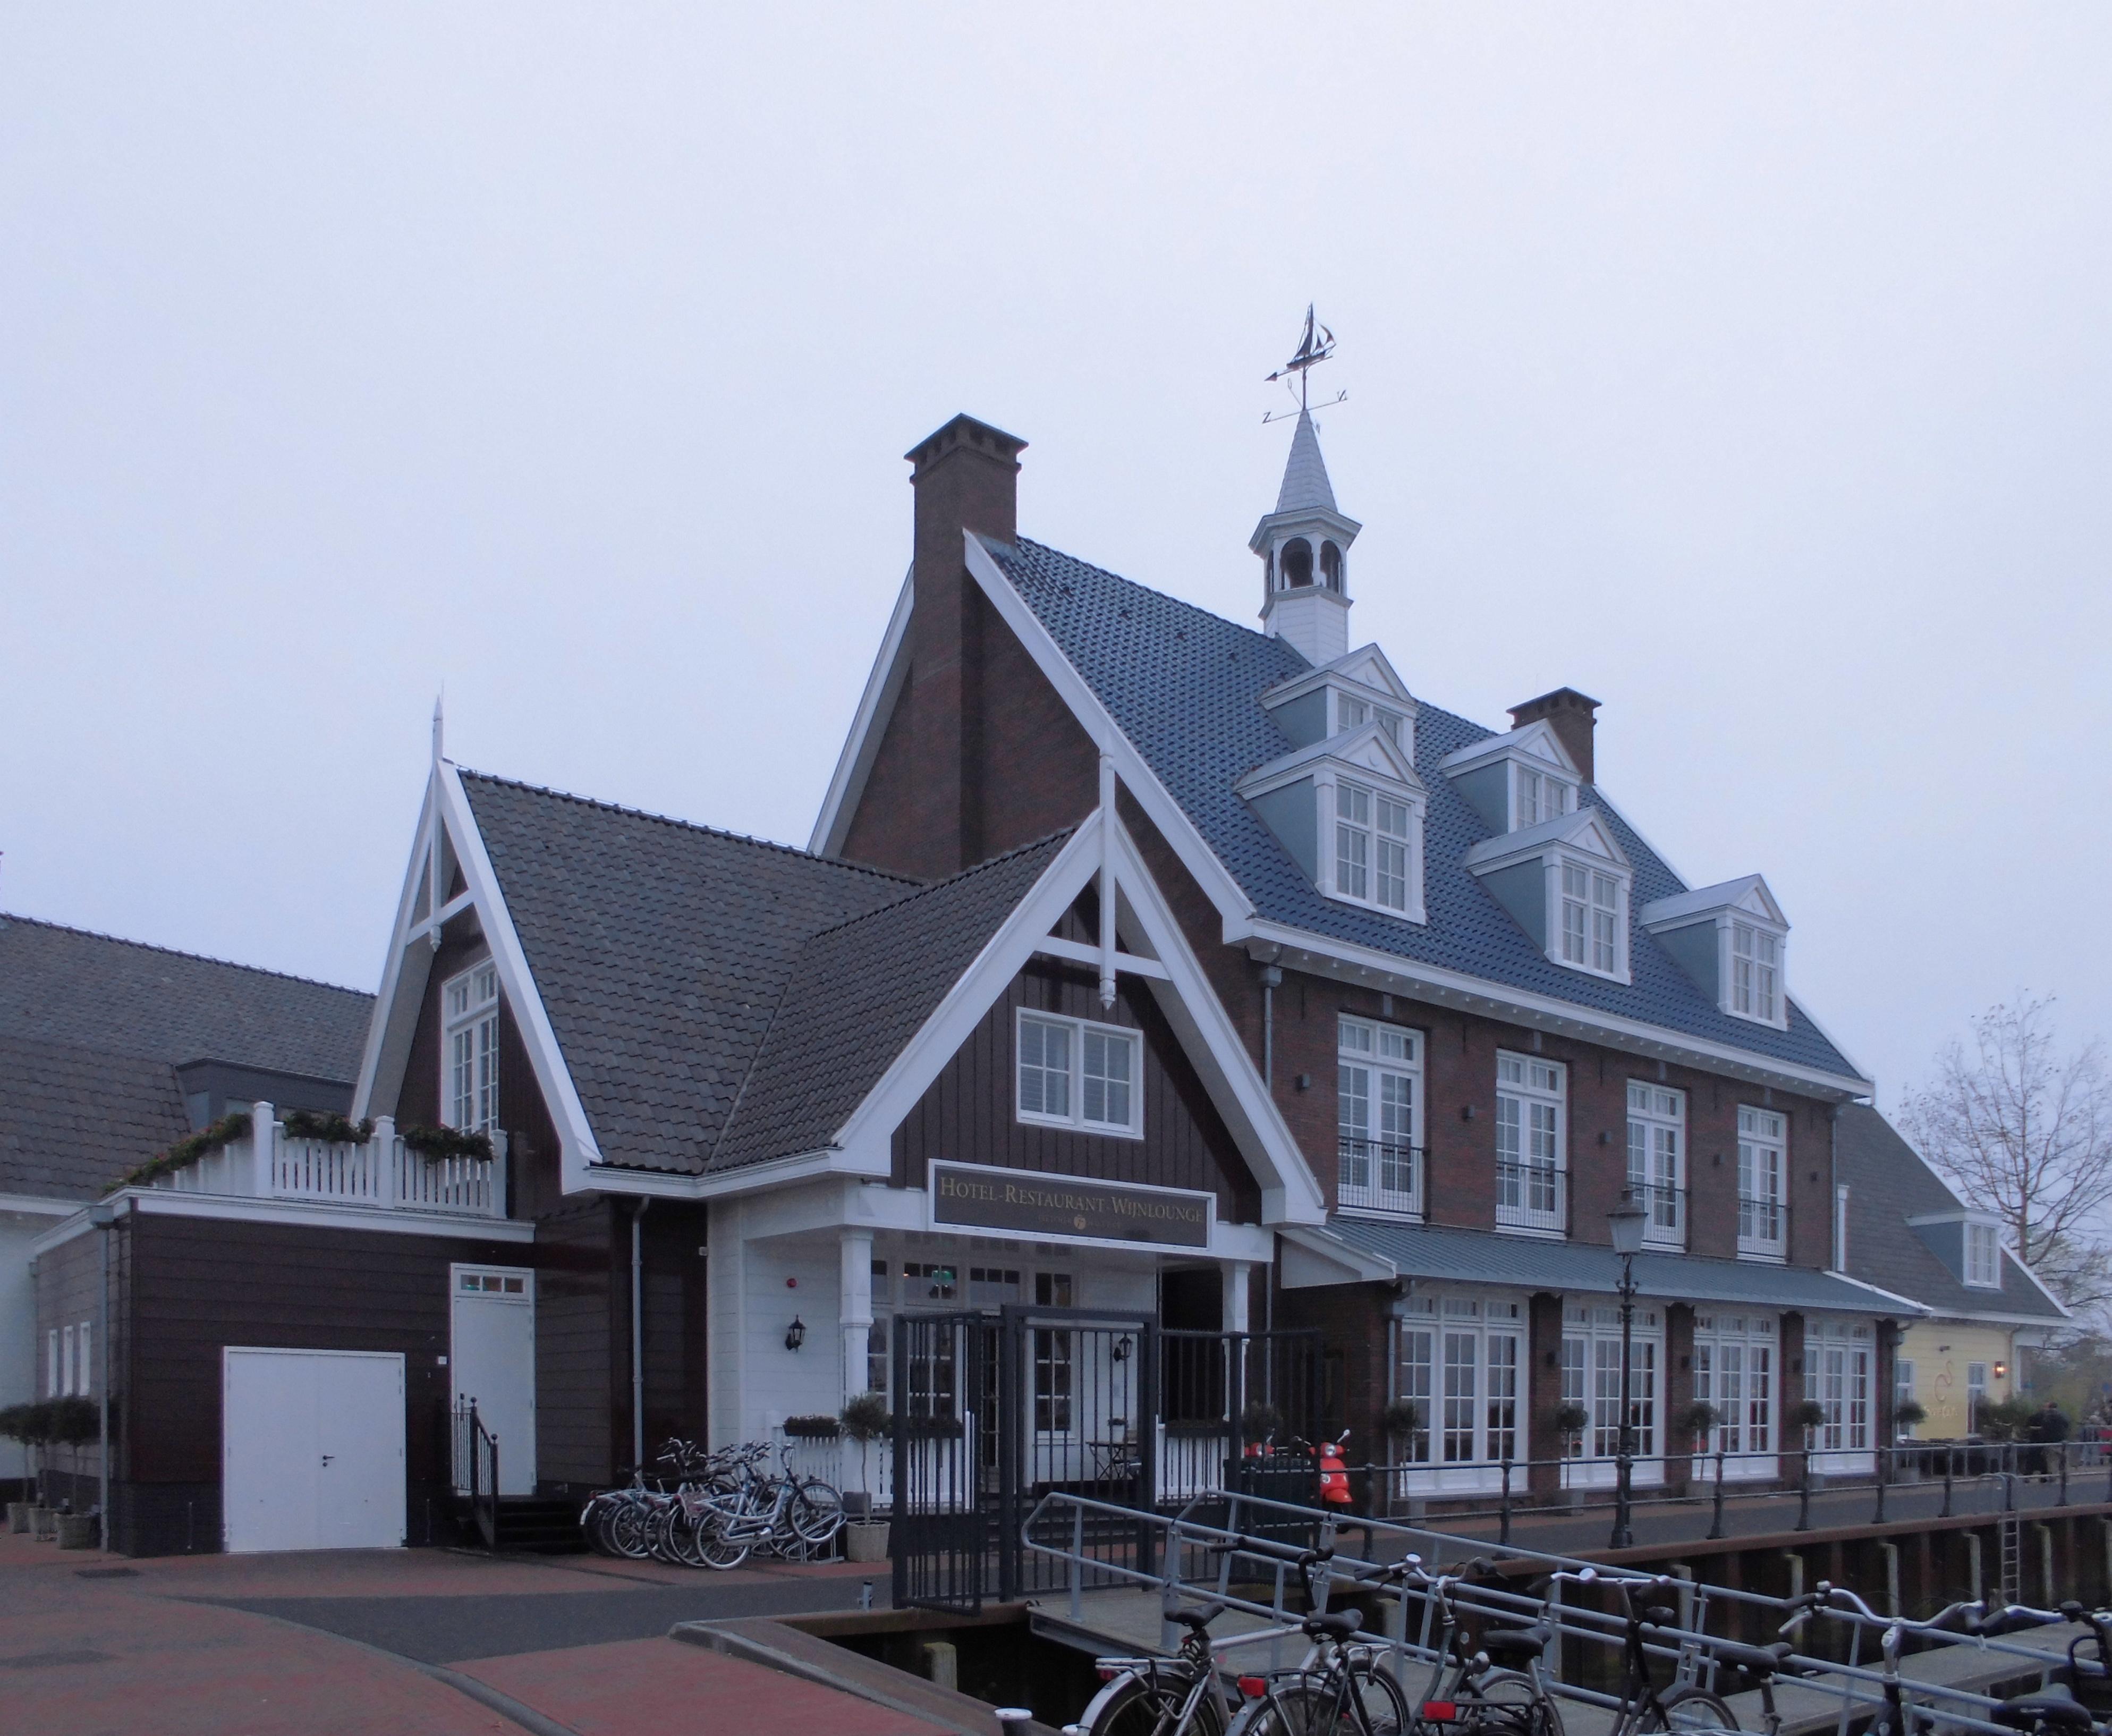 Hotel In Huizen : File:huizen hotel restaurant nautisch kwartier.jpg wikimedia commons